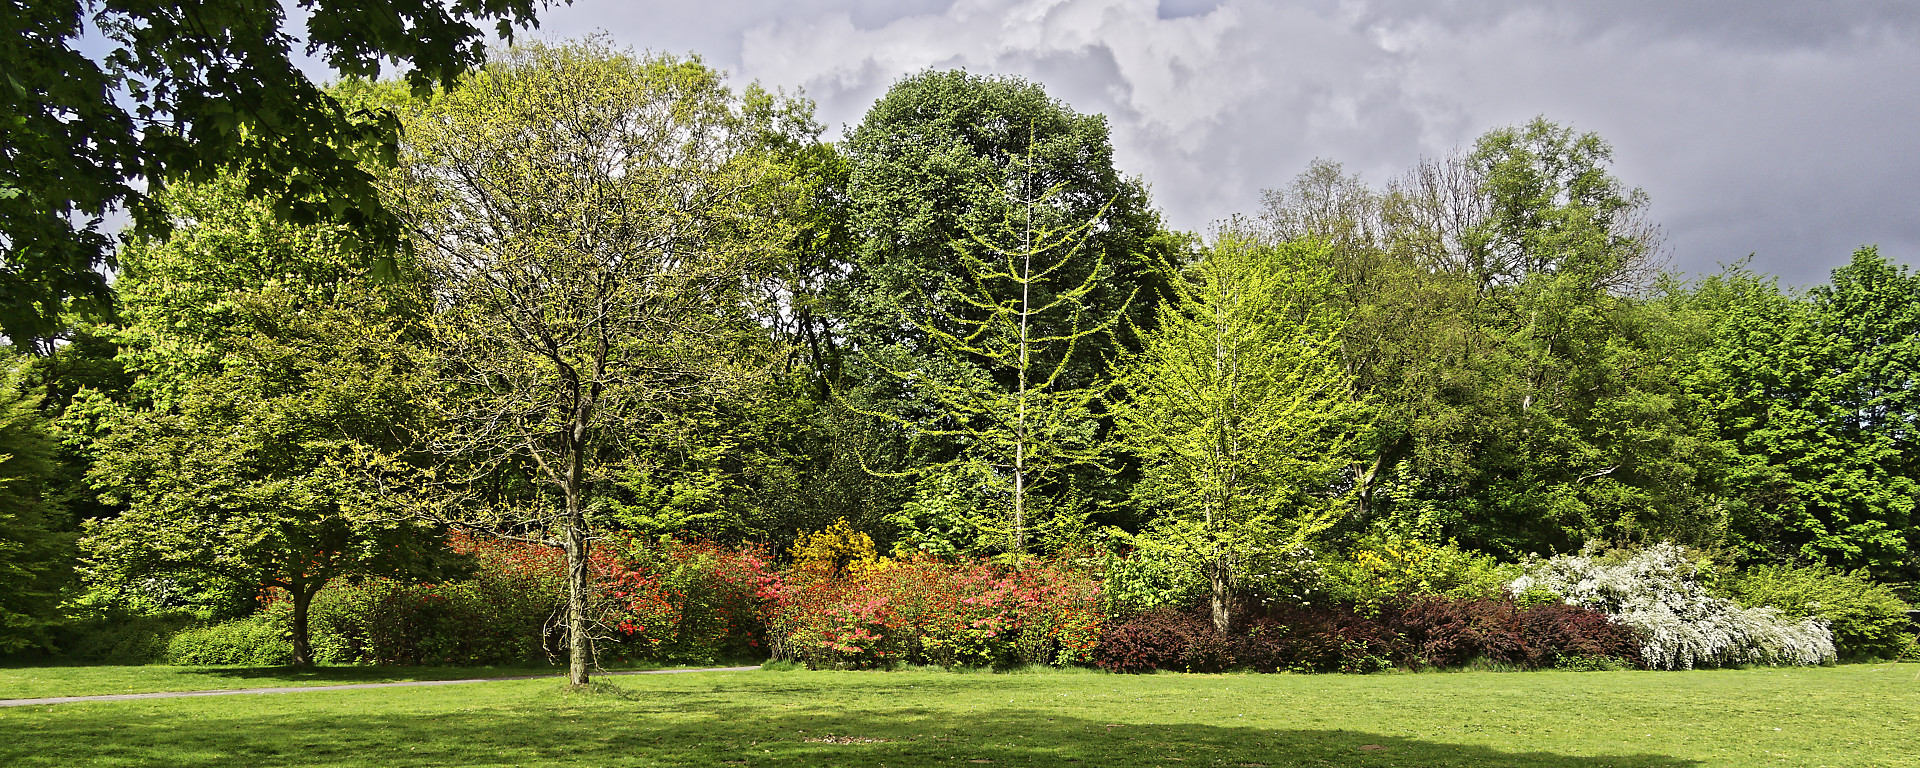 struiken en bomen in bloei